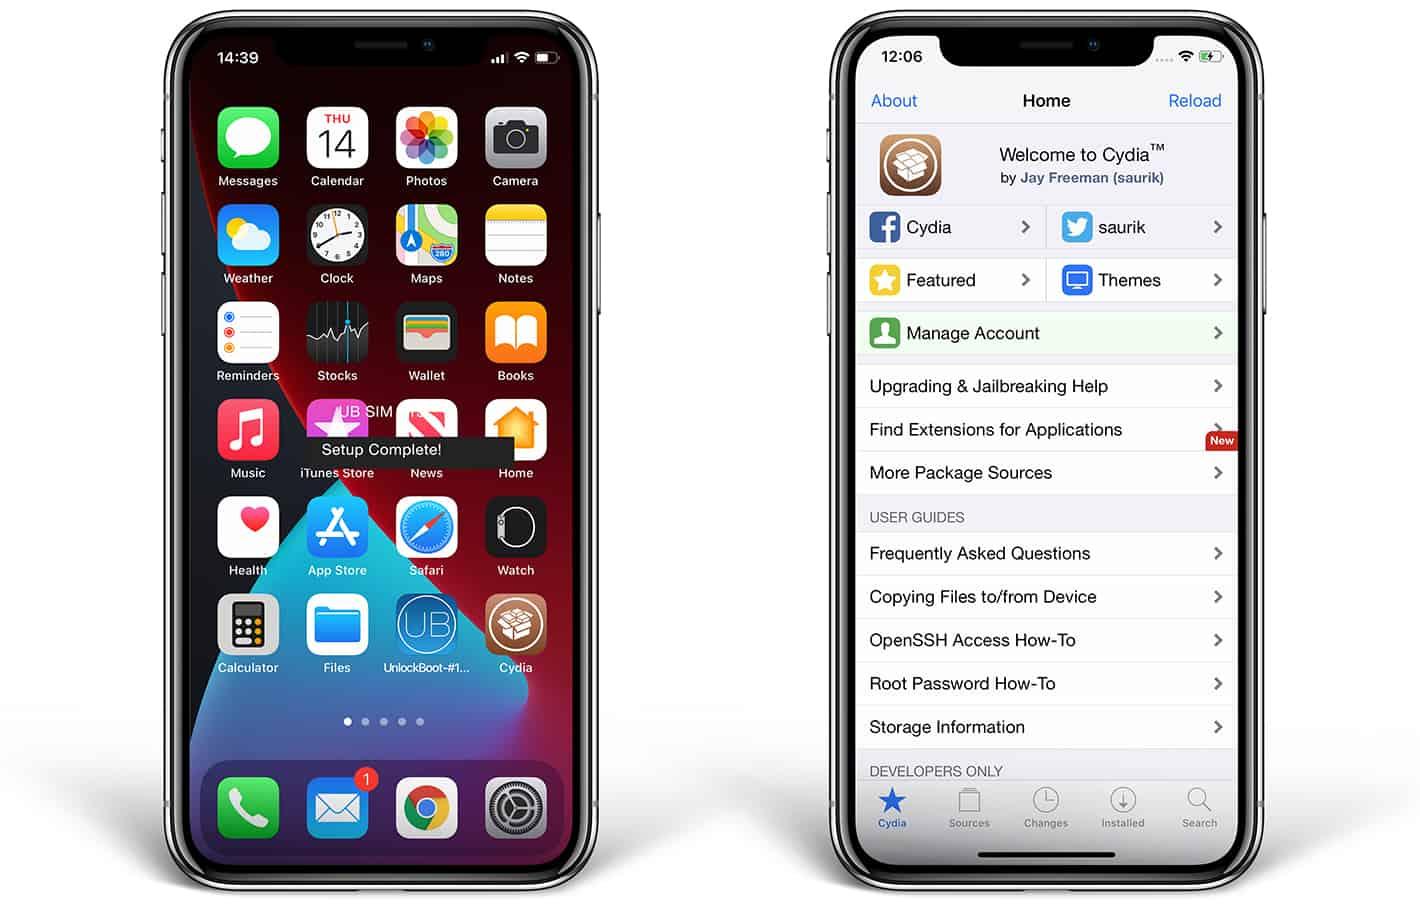 jailbreak iphone x ios 14.4